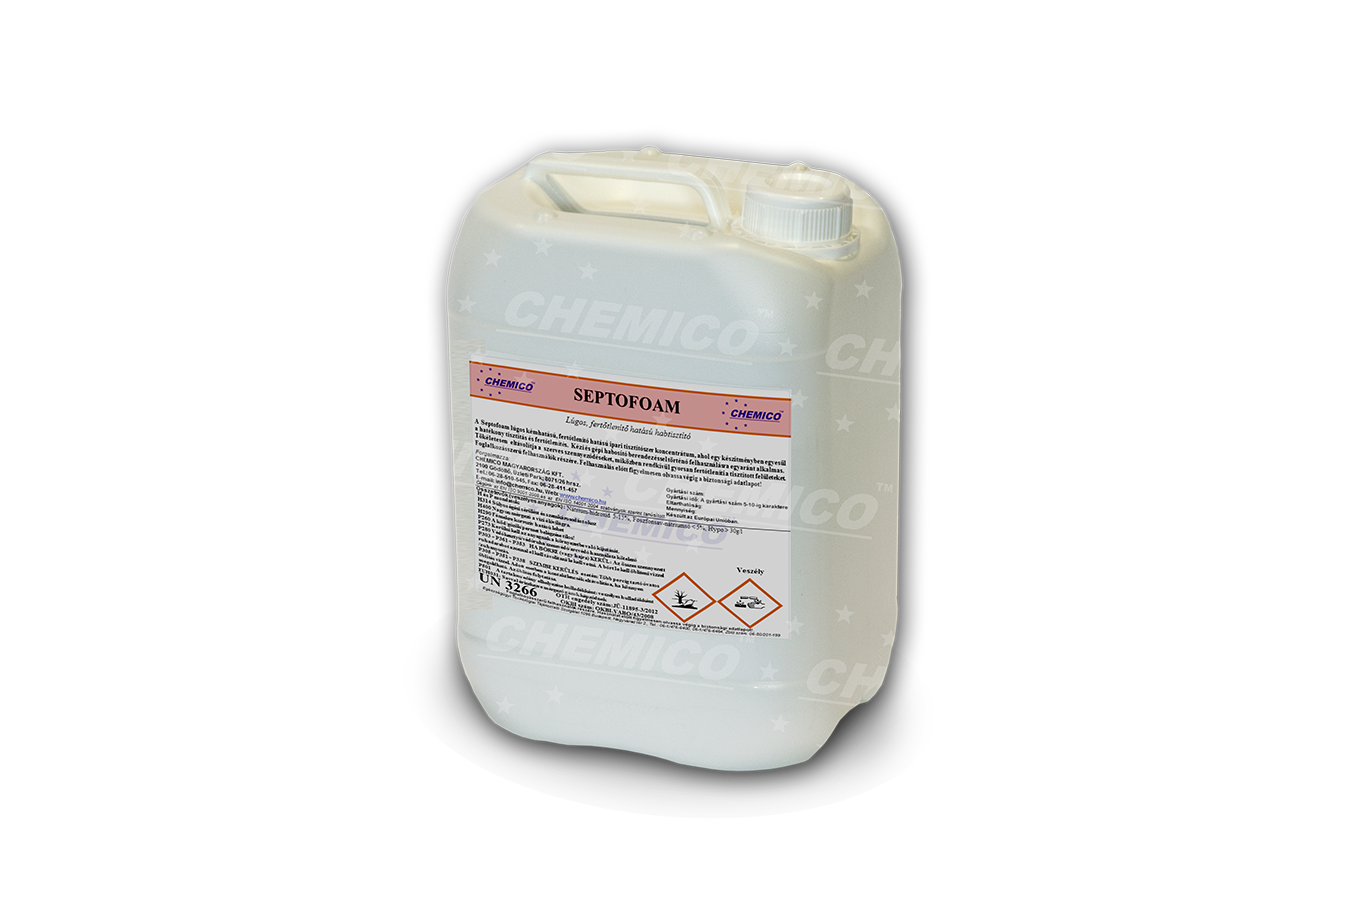 septofoam-lugos-fertotlenito-hab-tisztito-ipari-chemico-5l